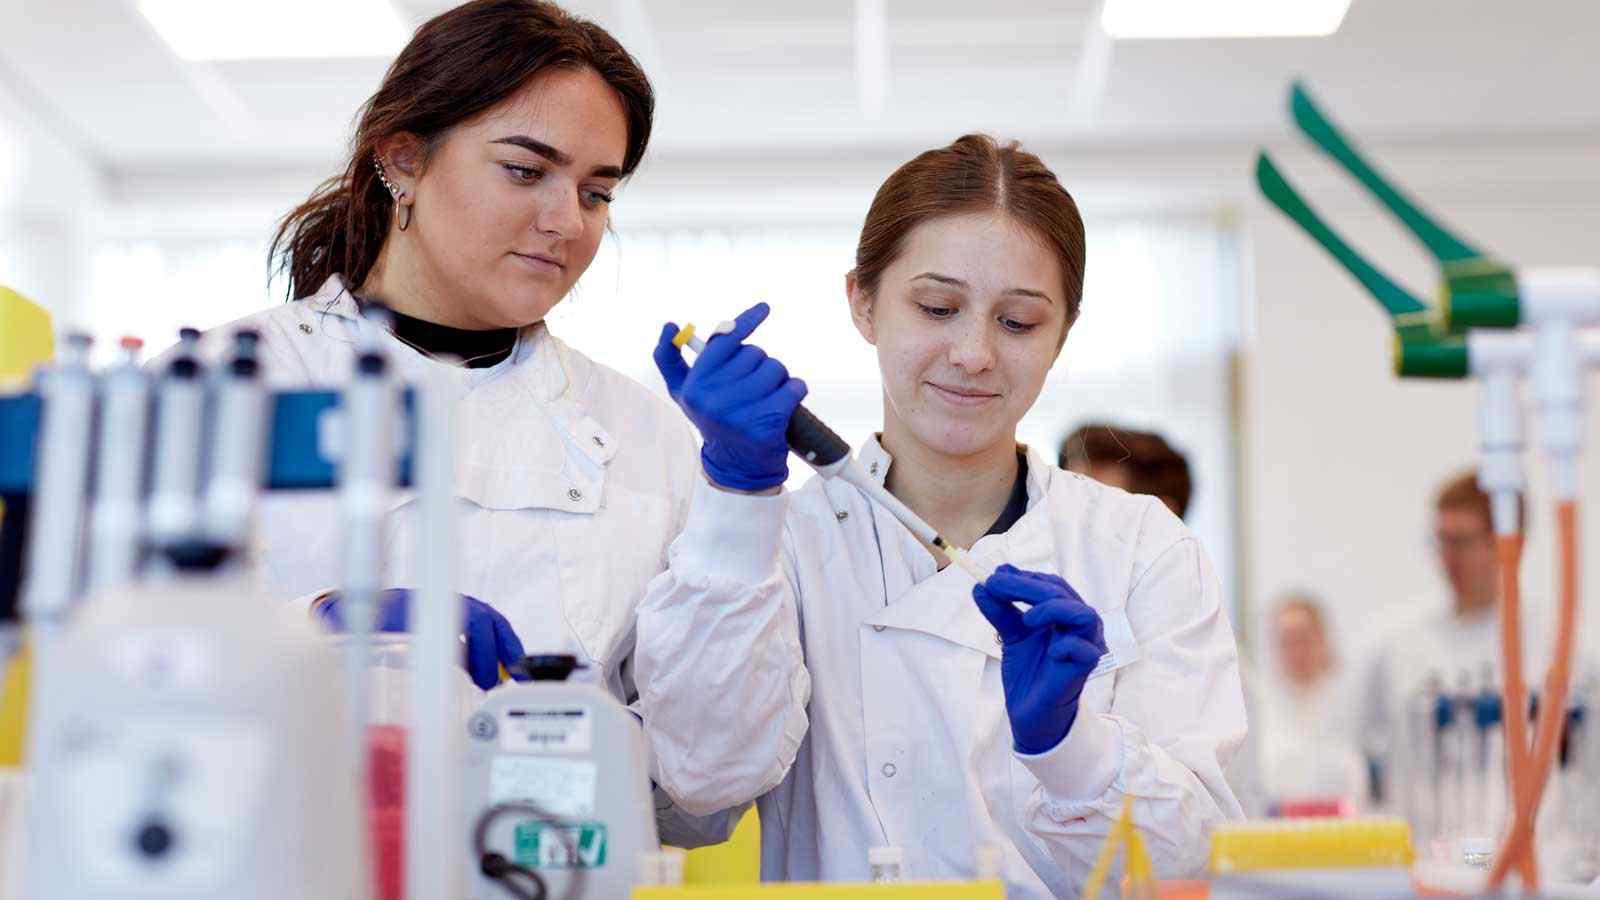 Biosciences students using laboratory equipment